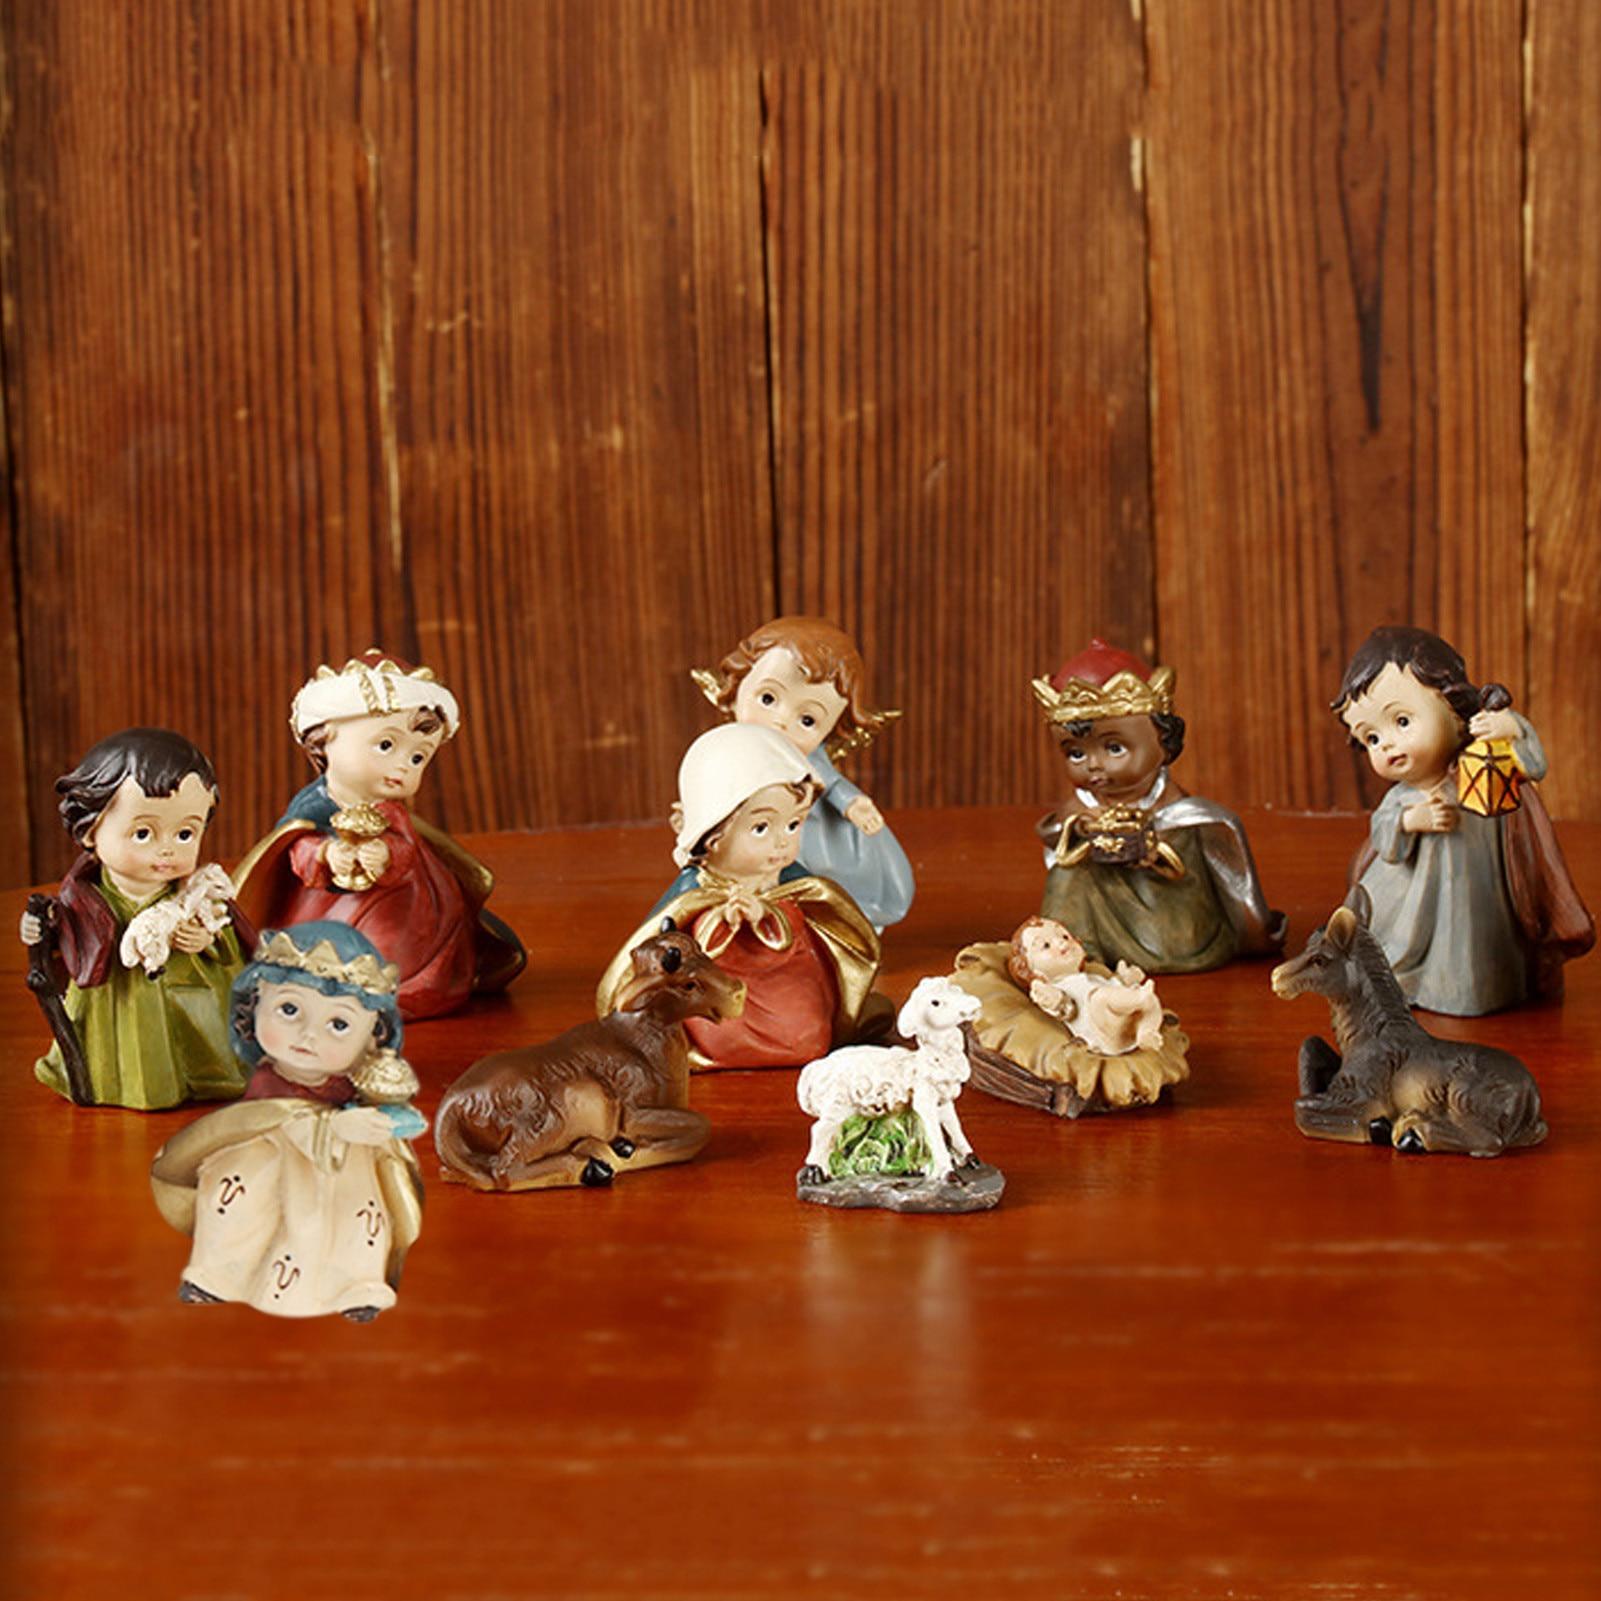 Capable 11pcs Nativity Scene Set Statue Christmas Crib Figurines Baby Jesus Manger Miniatures Ornament Church Catholic Gift Home Decor Pure And Mild Flavor